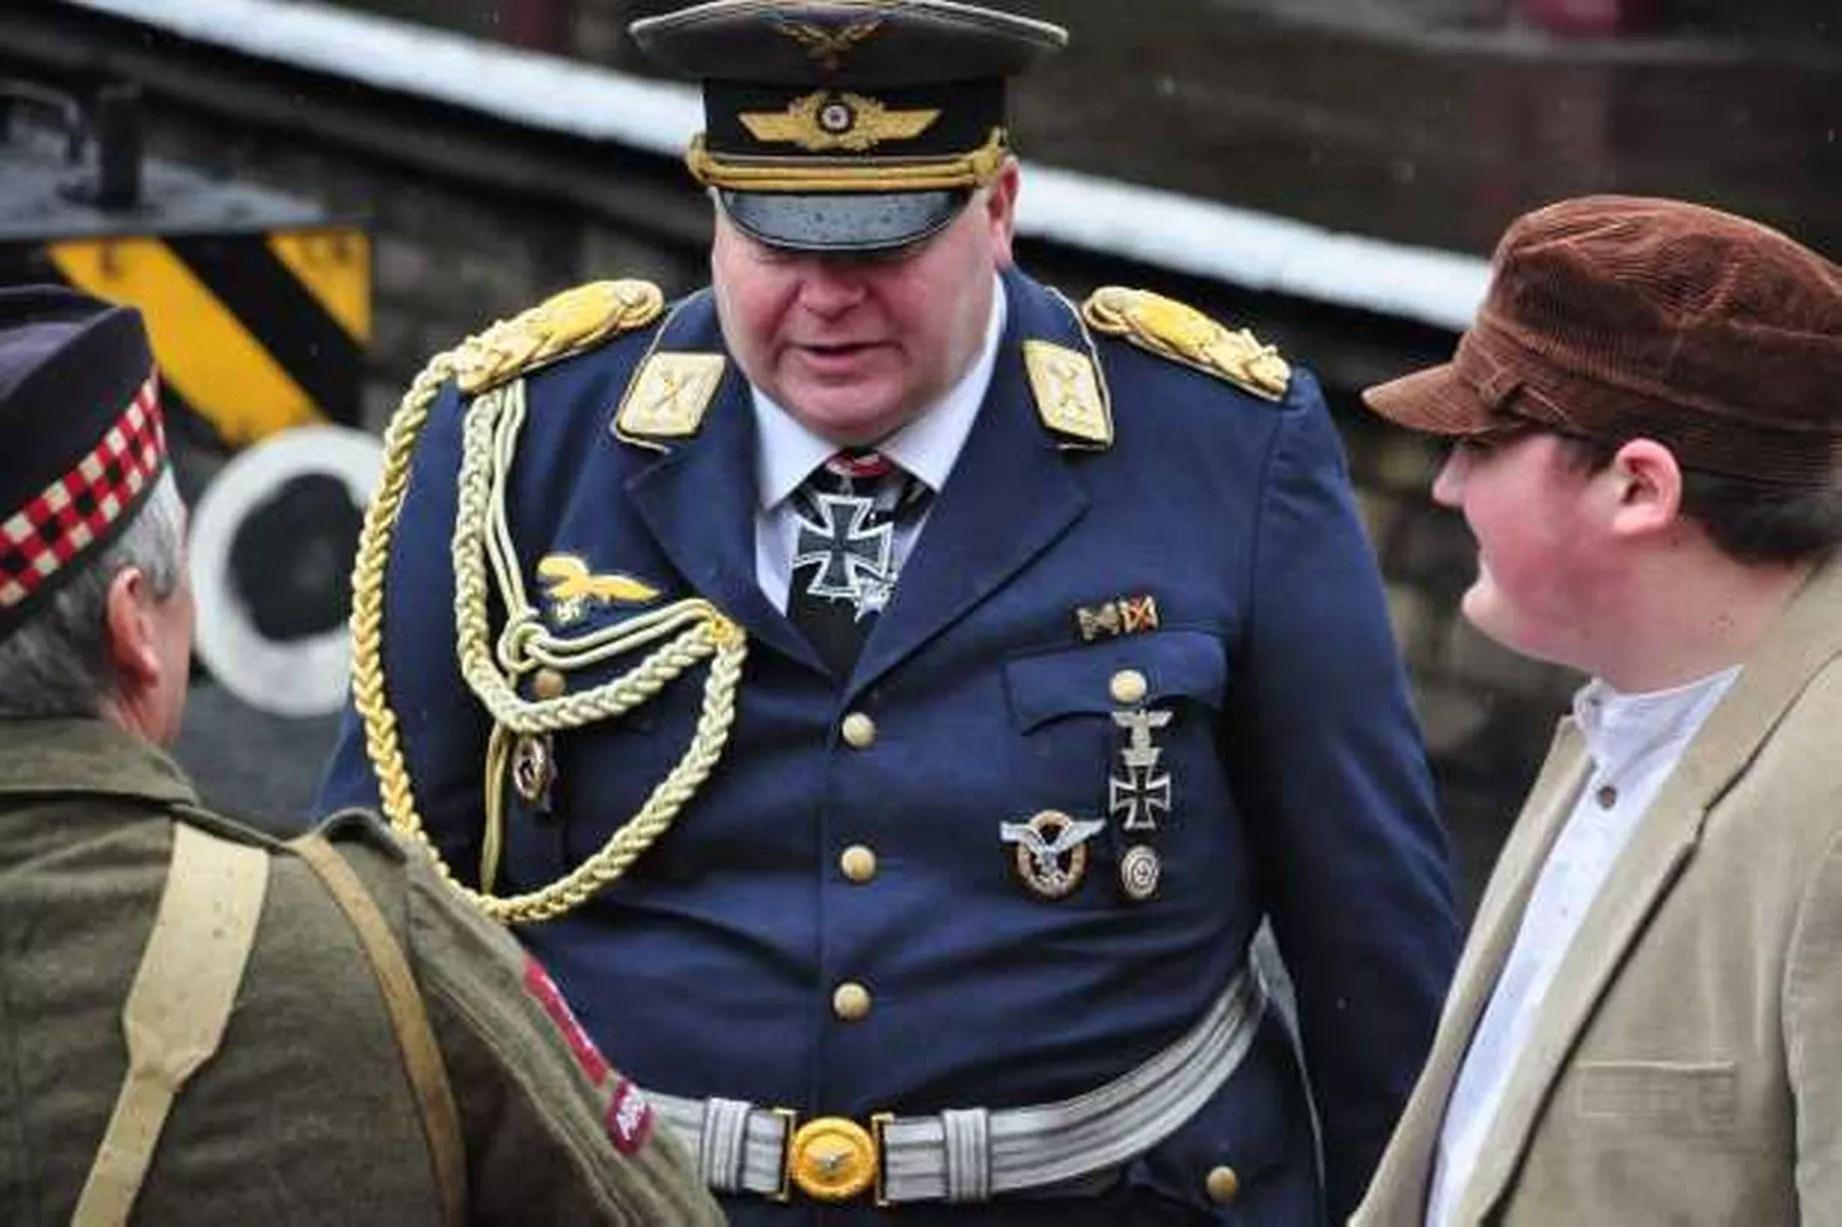 Nazi Uniforms At Wartime Weekend In Ramsbottom In